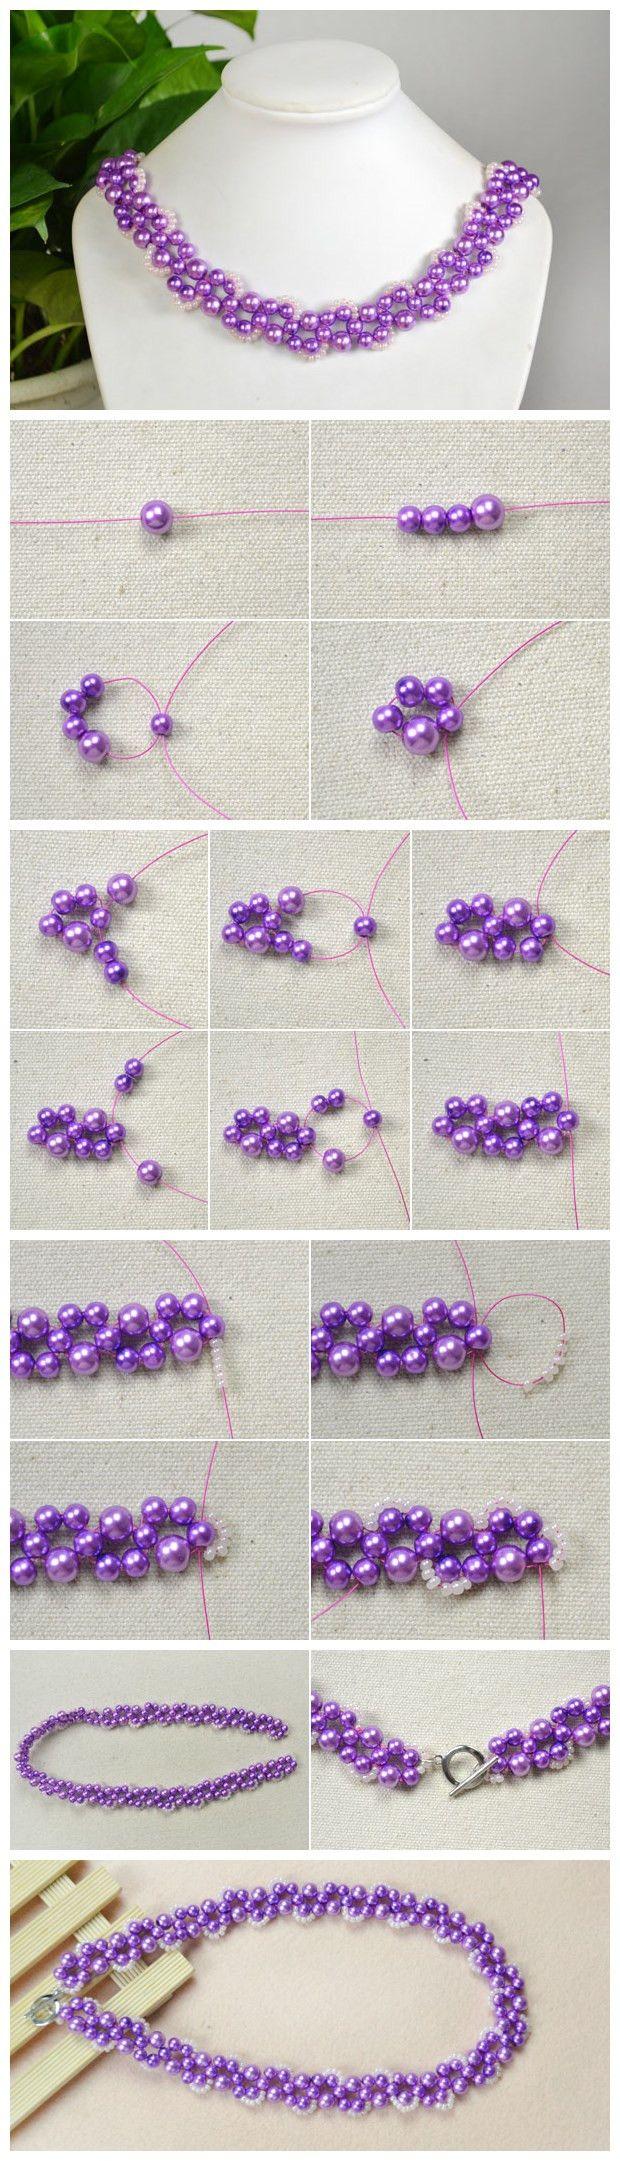 #Beebeecraft tutorials on How to make Your Own Beautiful #PurpleBead #Necklace